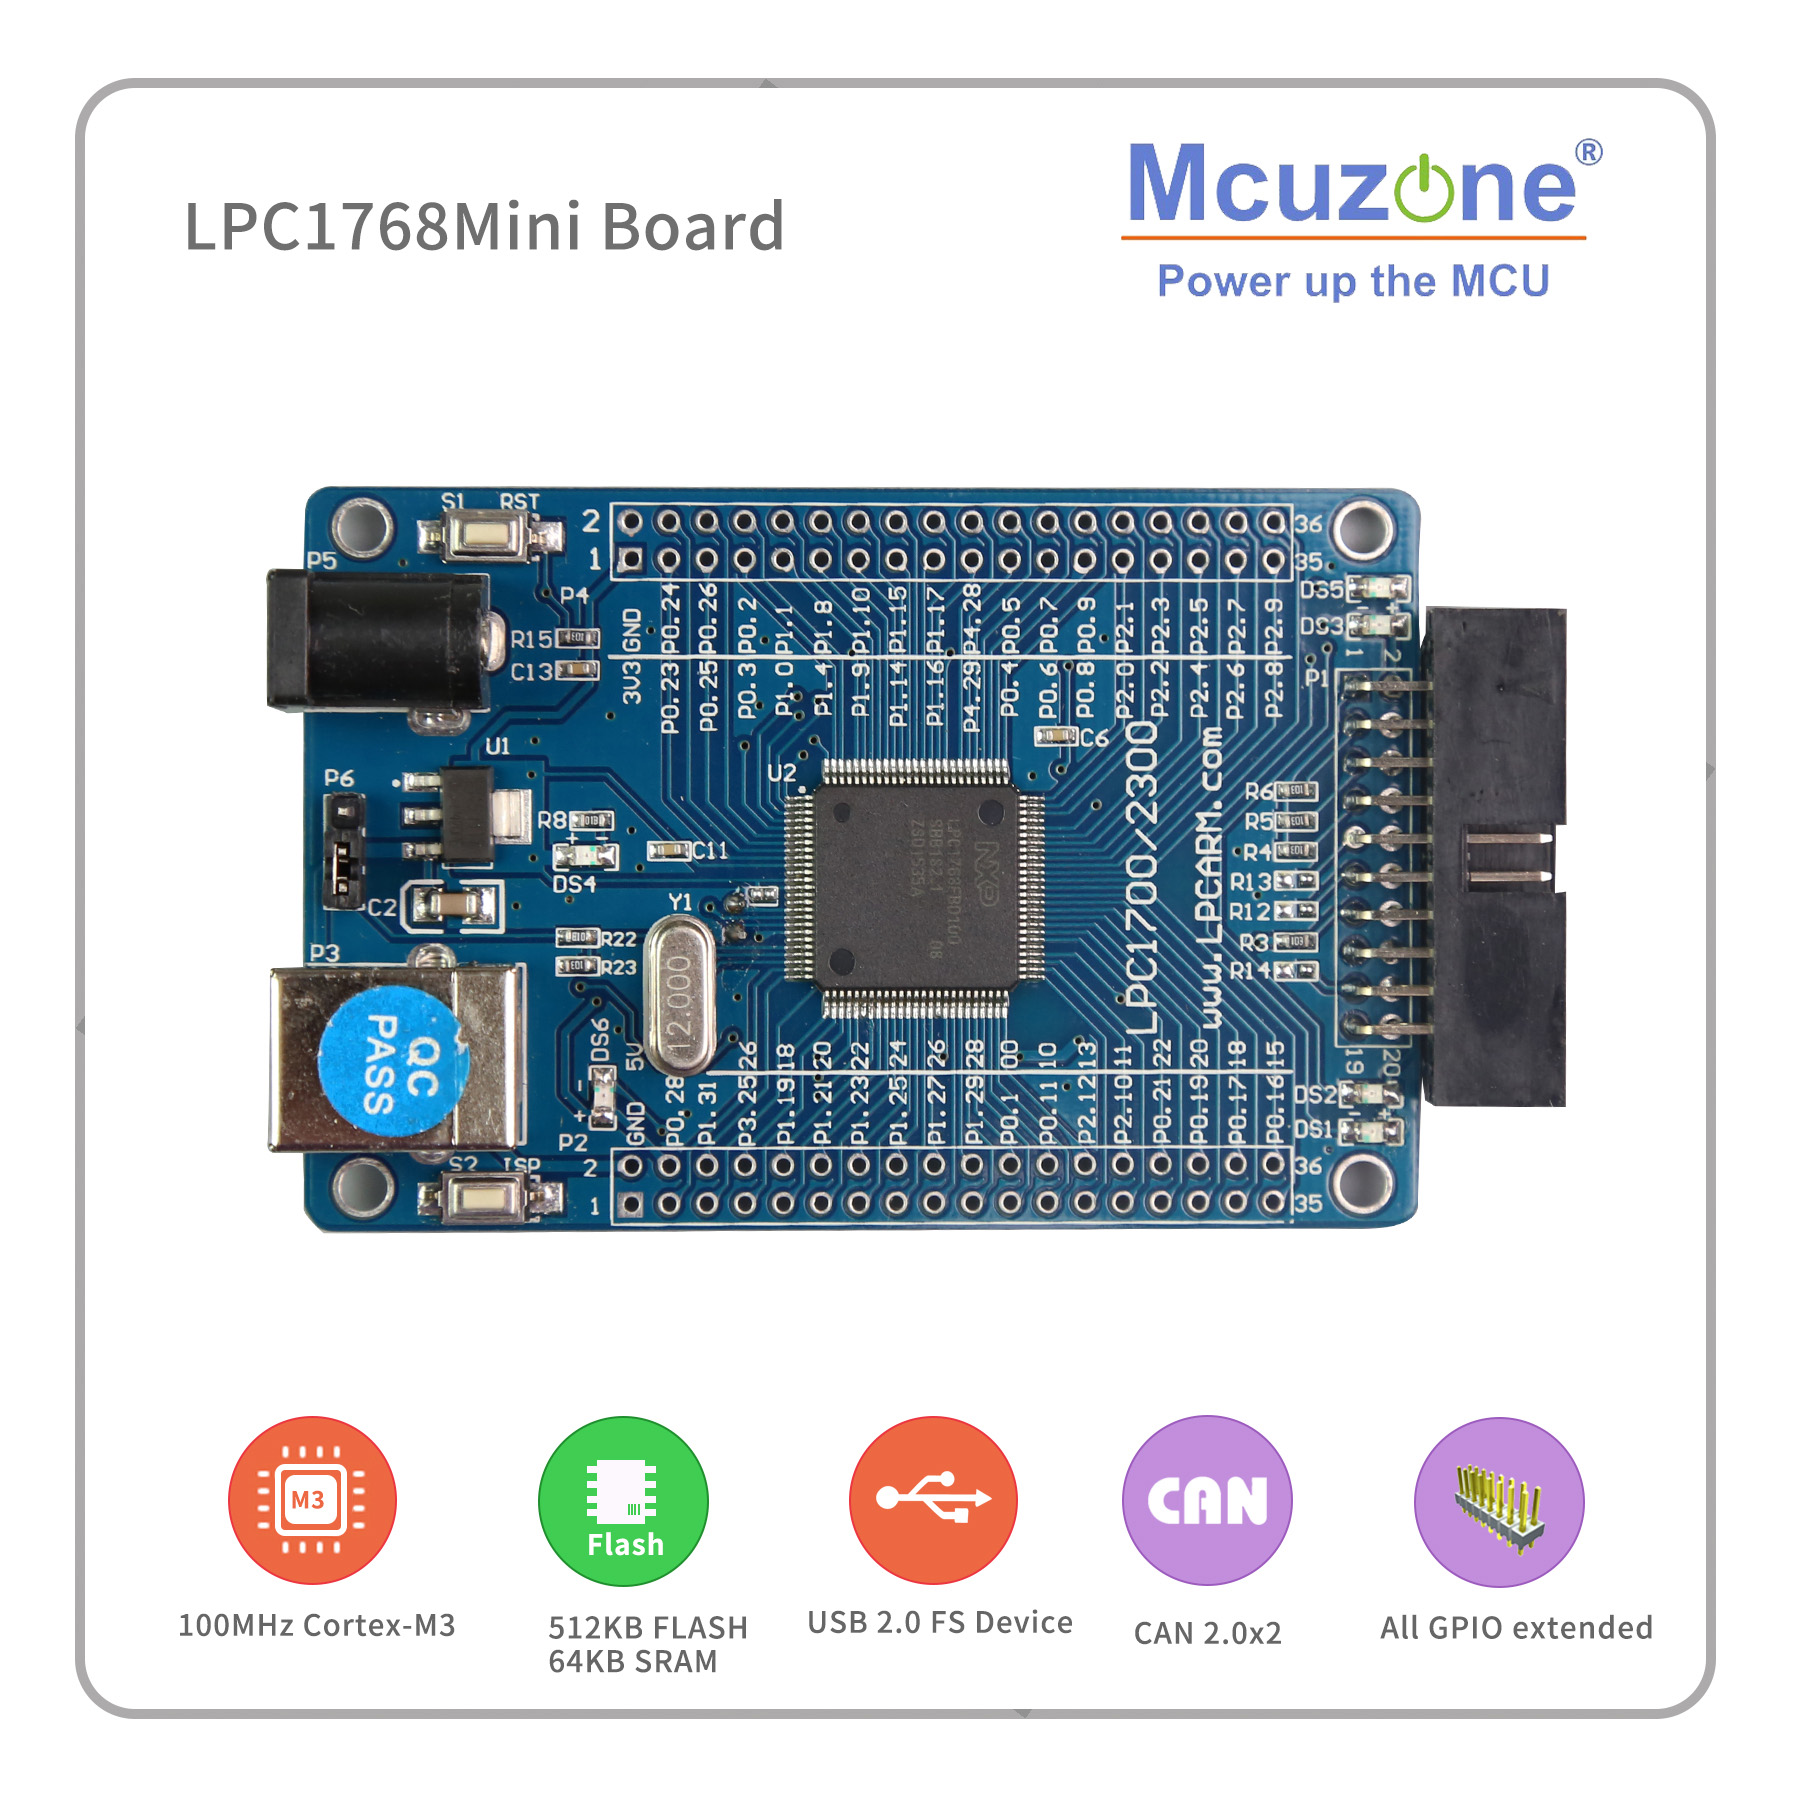 ADC 100 MHz - LPC1768 Mini board  100MHz Cortex-M3, USB, EMAC, UART, SPI, I2C, ADC, DAC, SD NXP GPIO